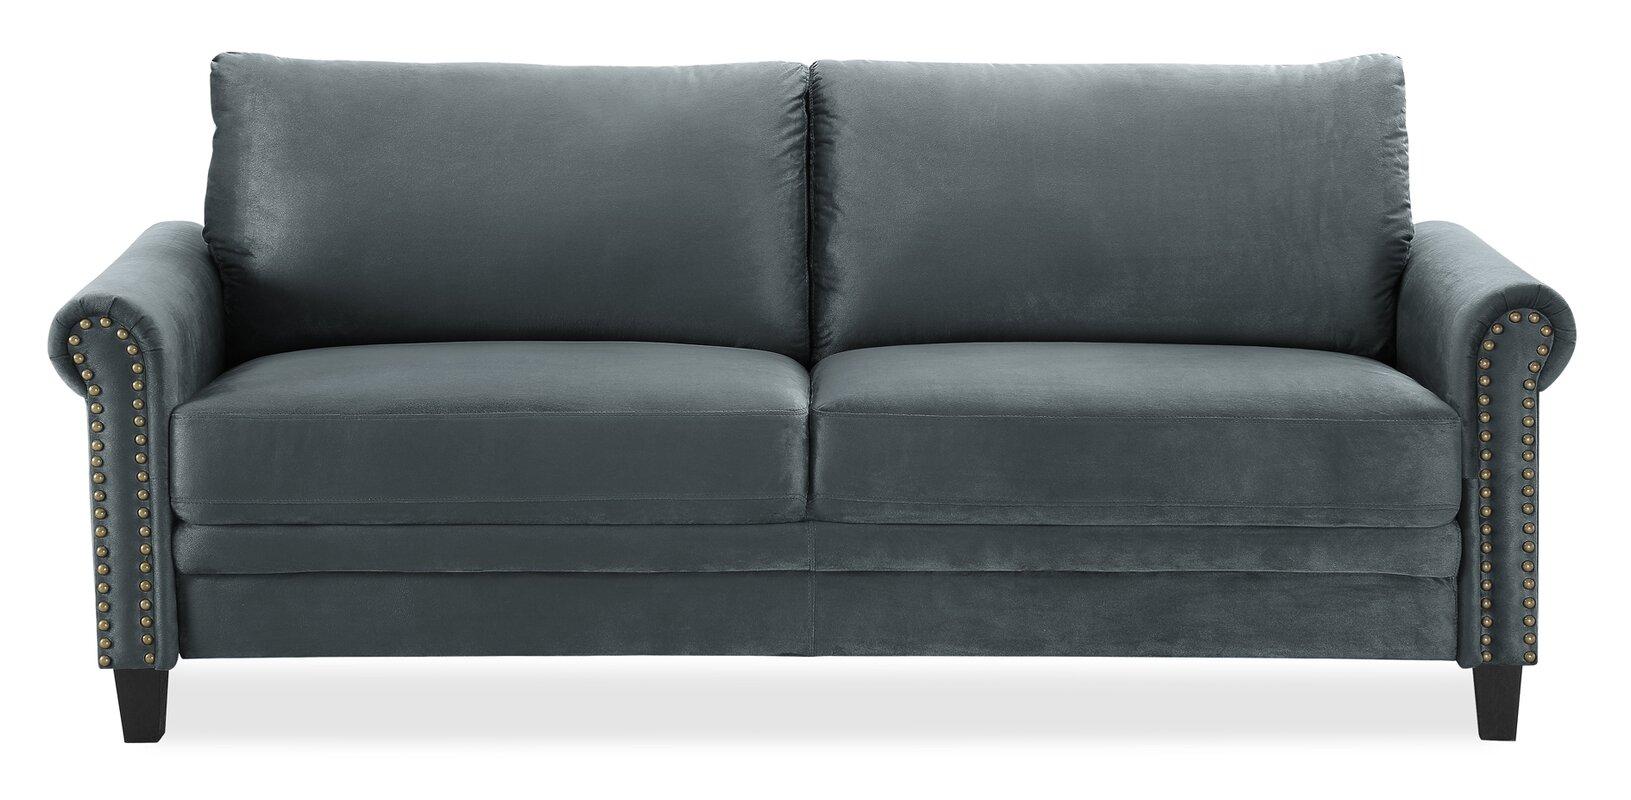 Childress Sofa